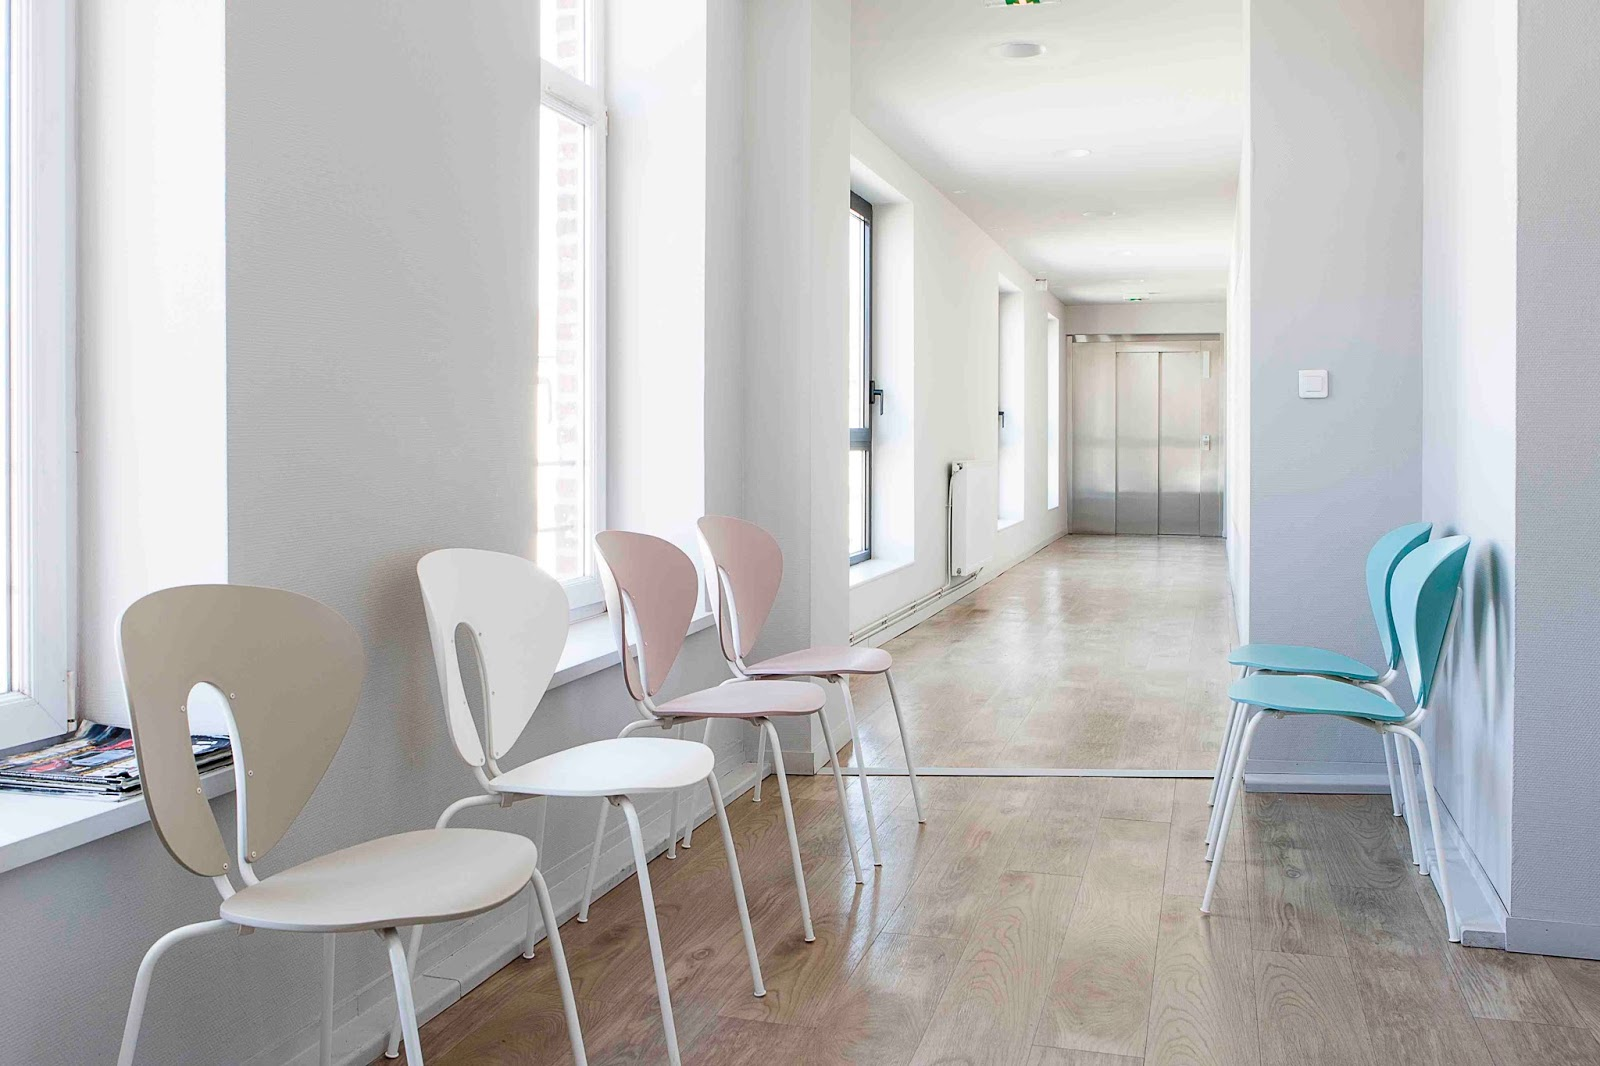 cabinet de radiologie armenti 232 res 59 agence delannoy simoens architectes dplg